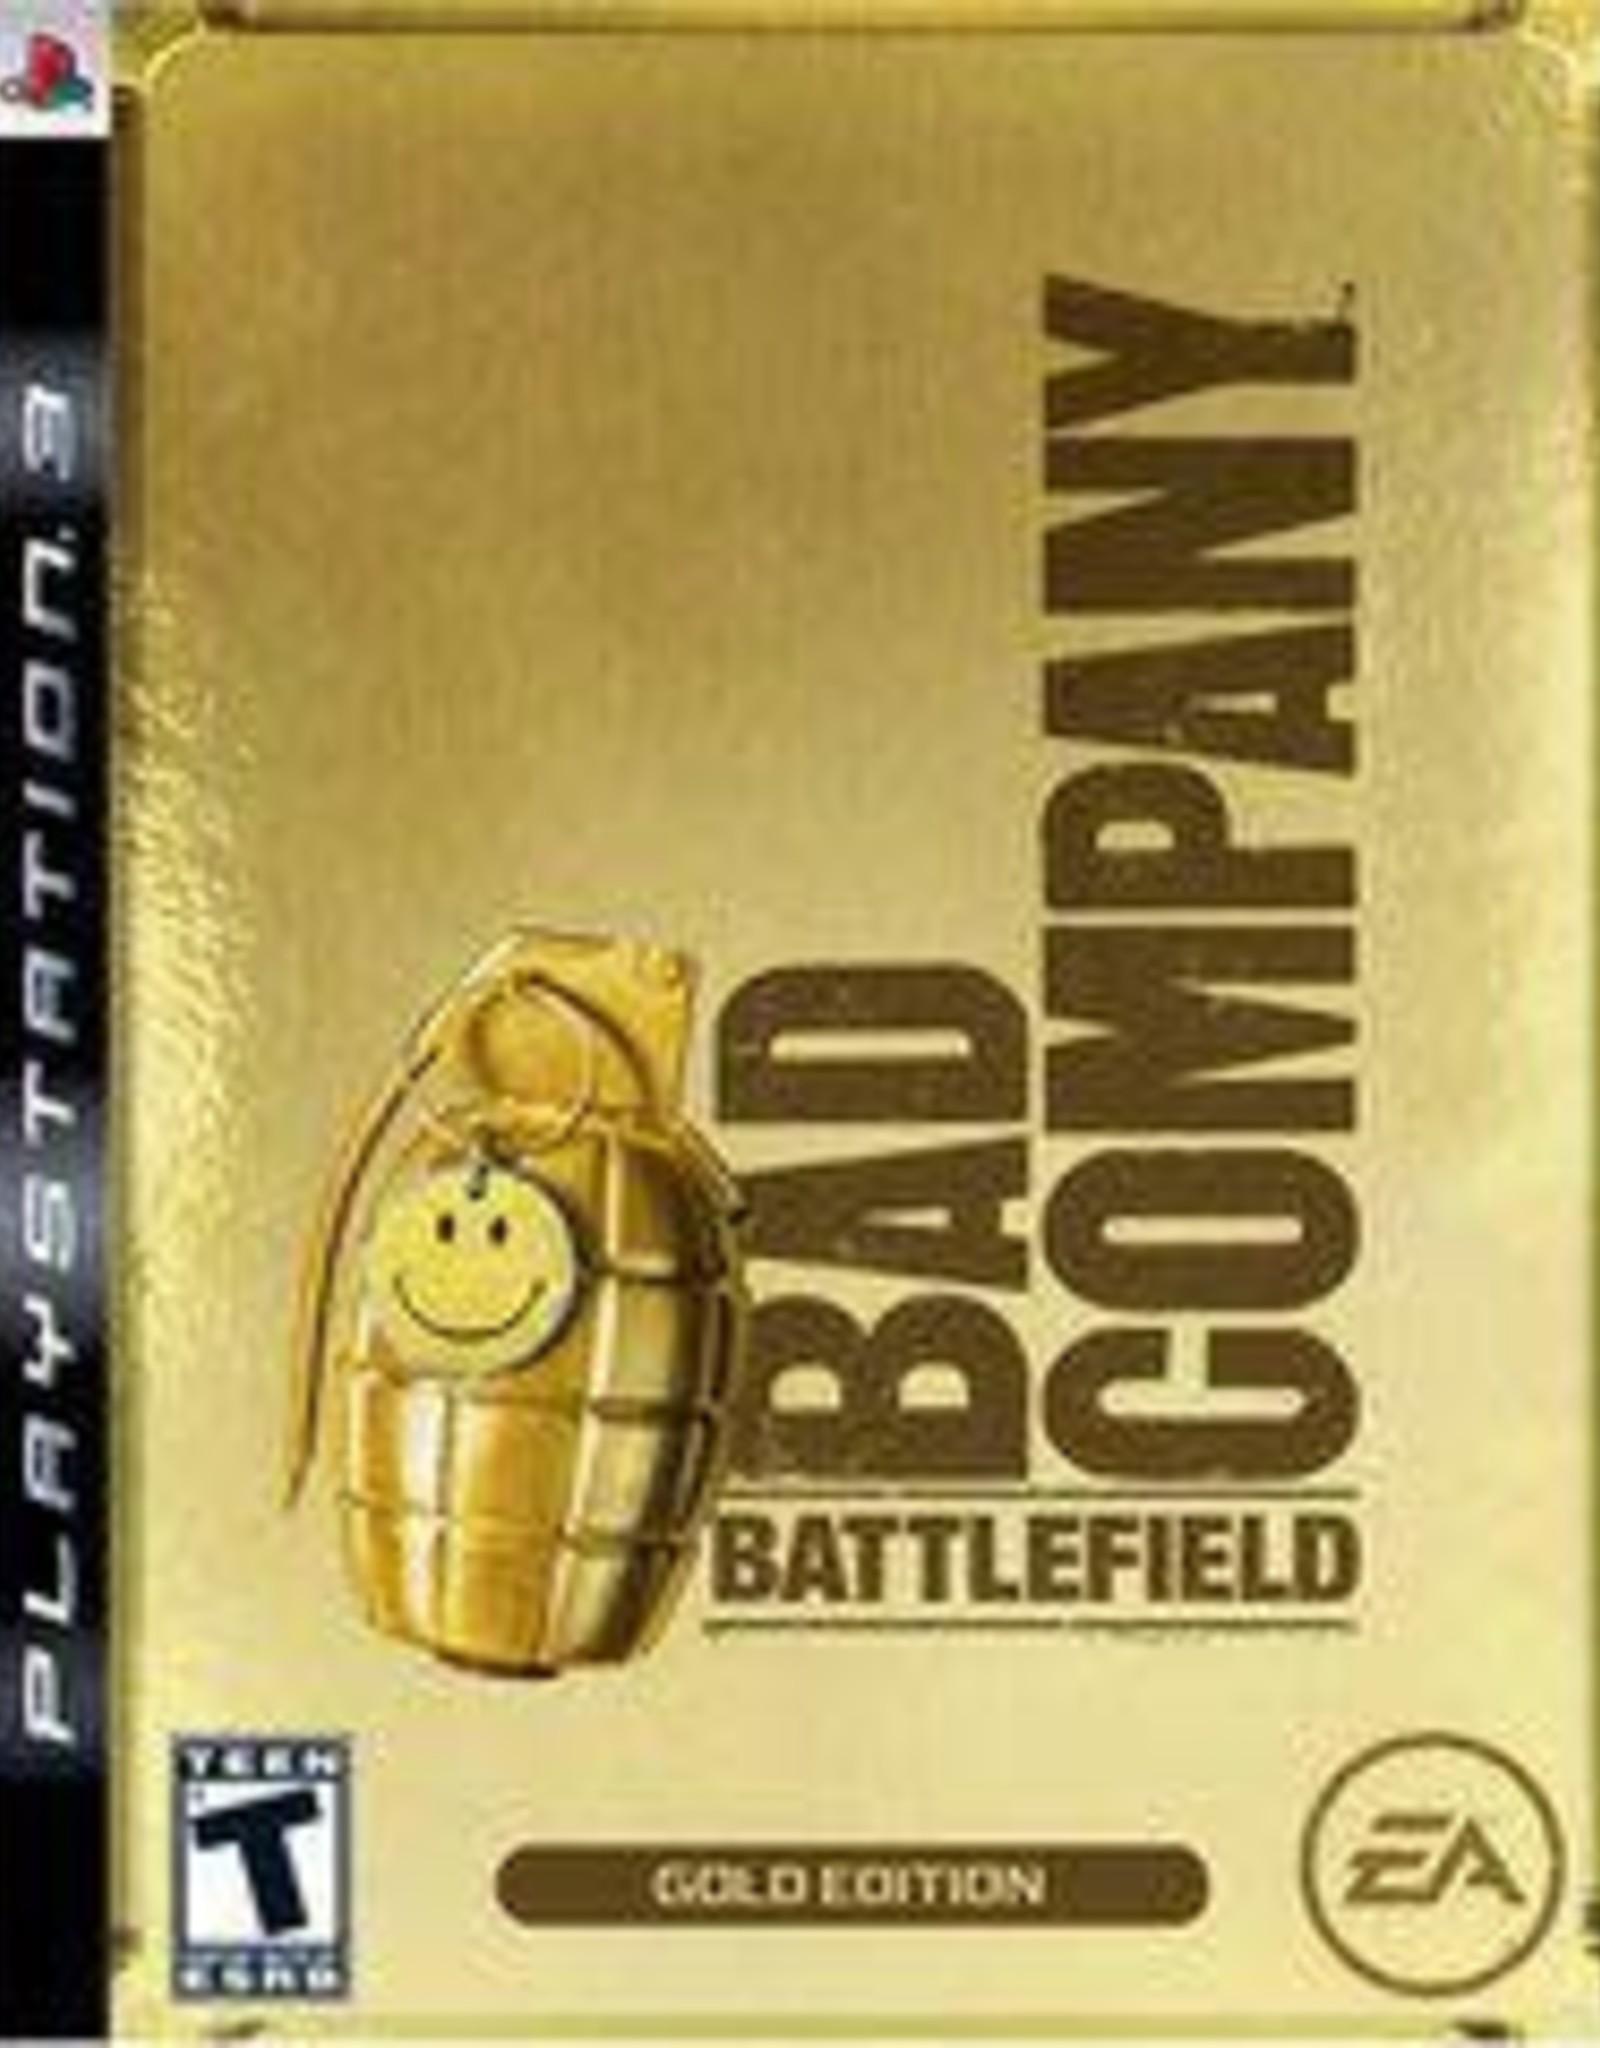 Playstation 3 Battlefield Bad Company Gold Edition